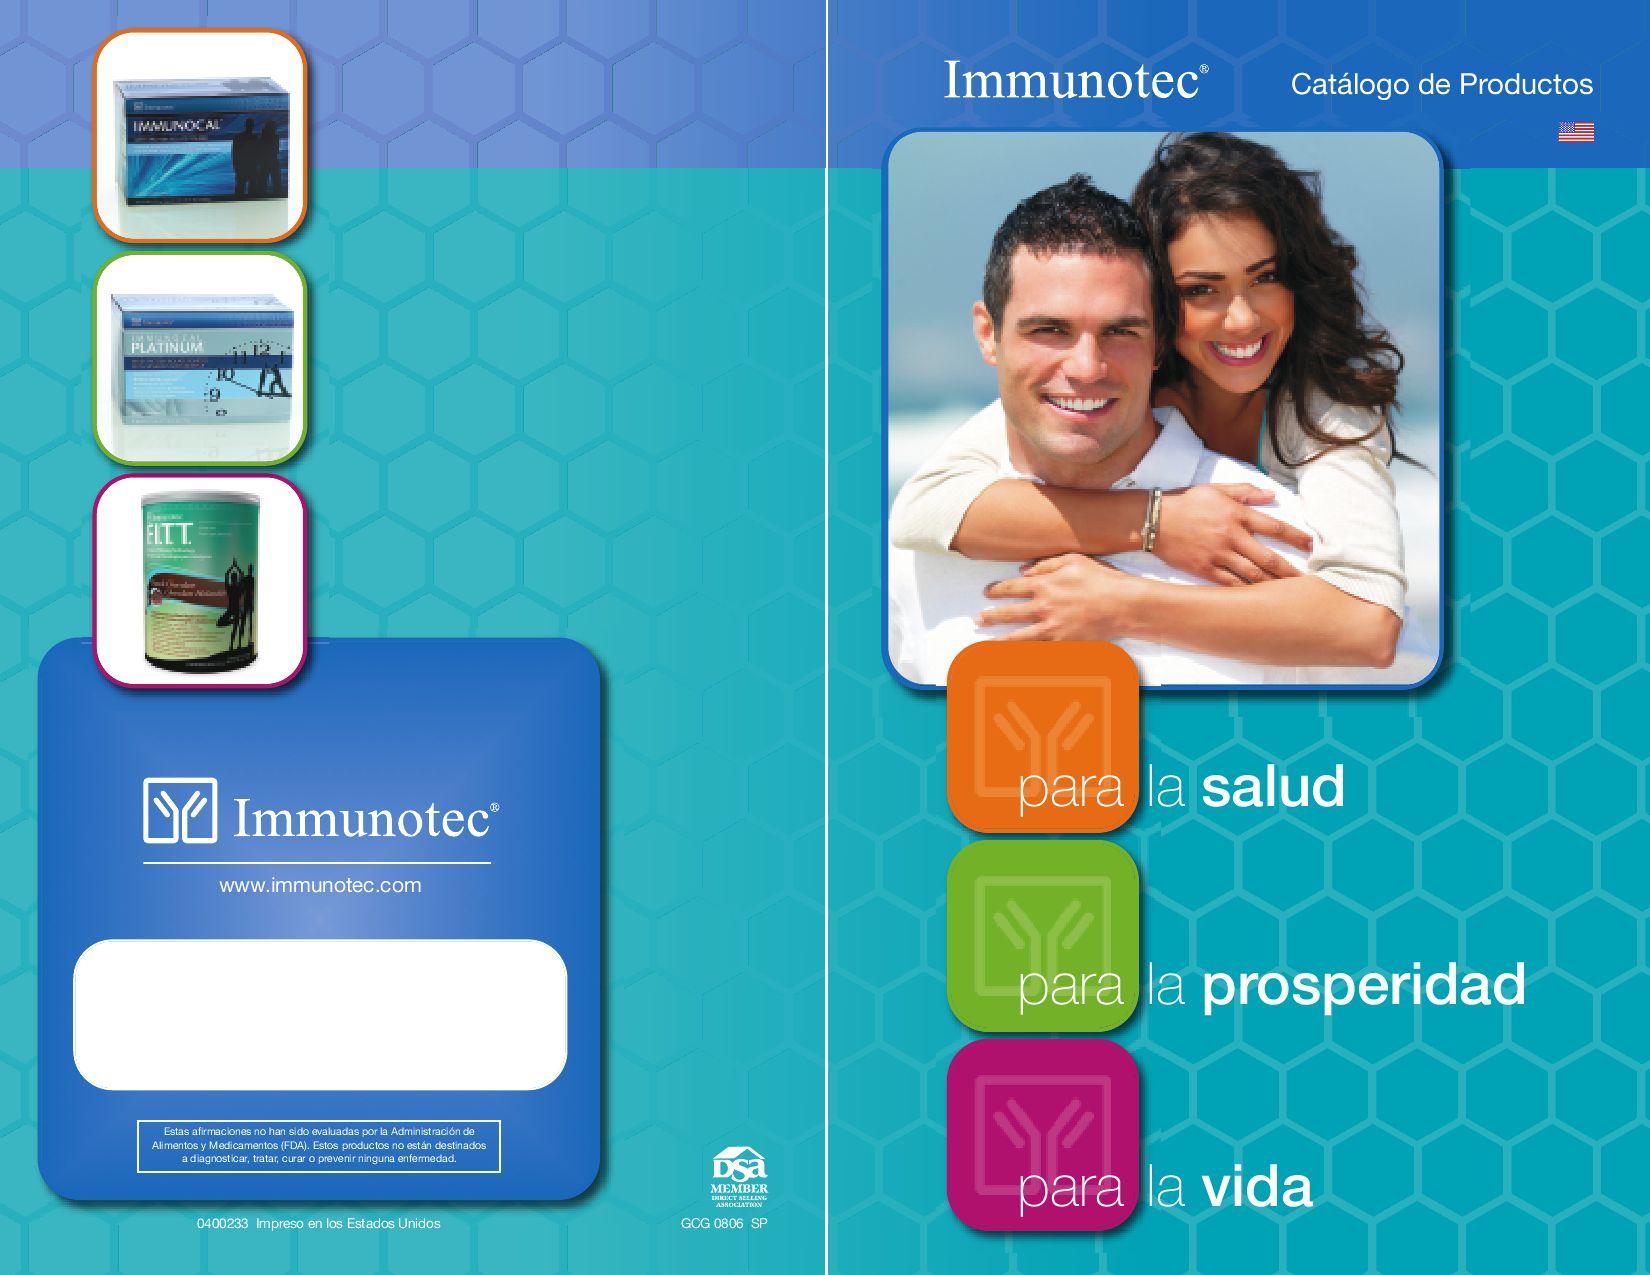 immunocal para cancer de prostata